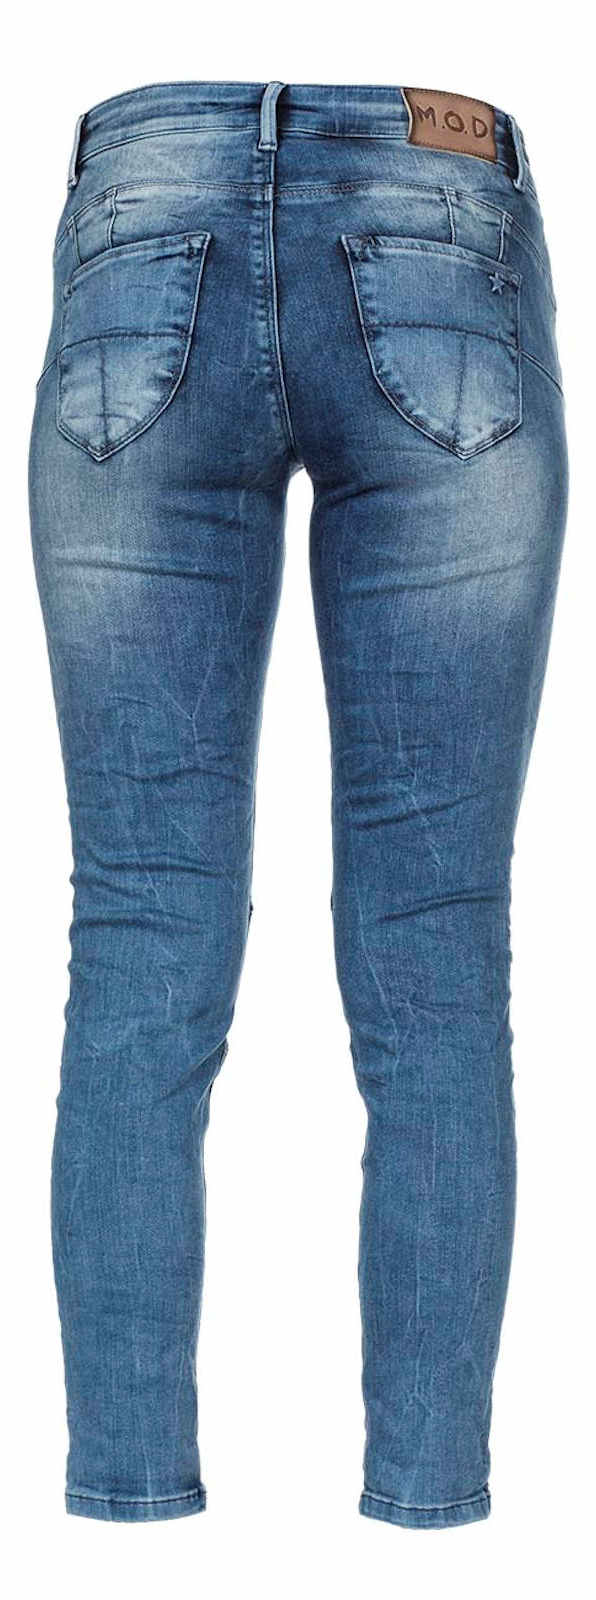 Hose Leg Damen M o Medium Hüft 2032 Nos Waist Skinny Jeans d Mod Eva RRfqFx